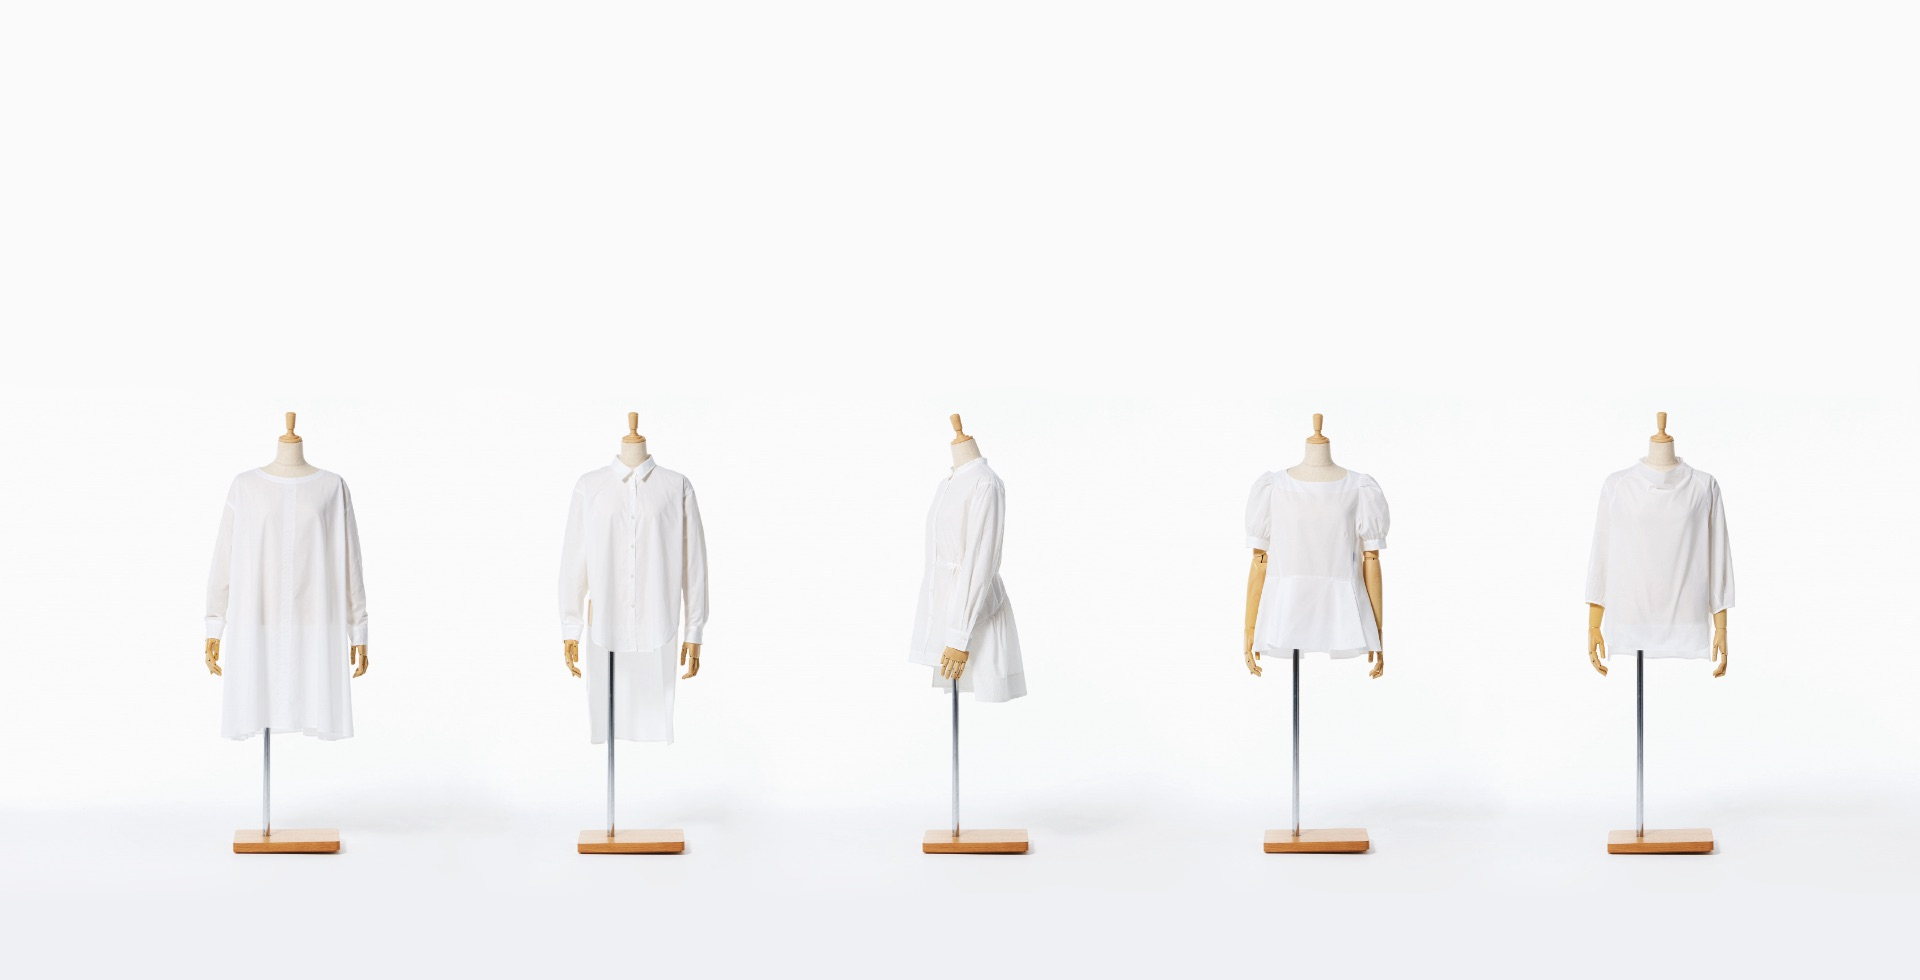 WHITE SHIRTS SERIES